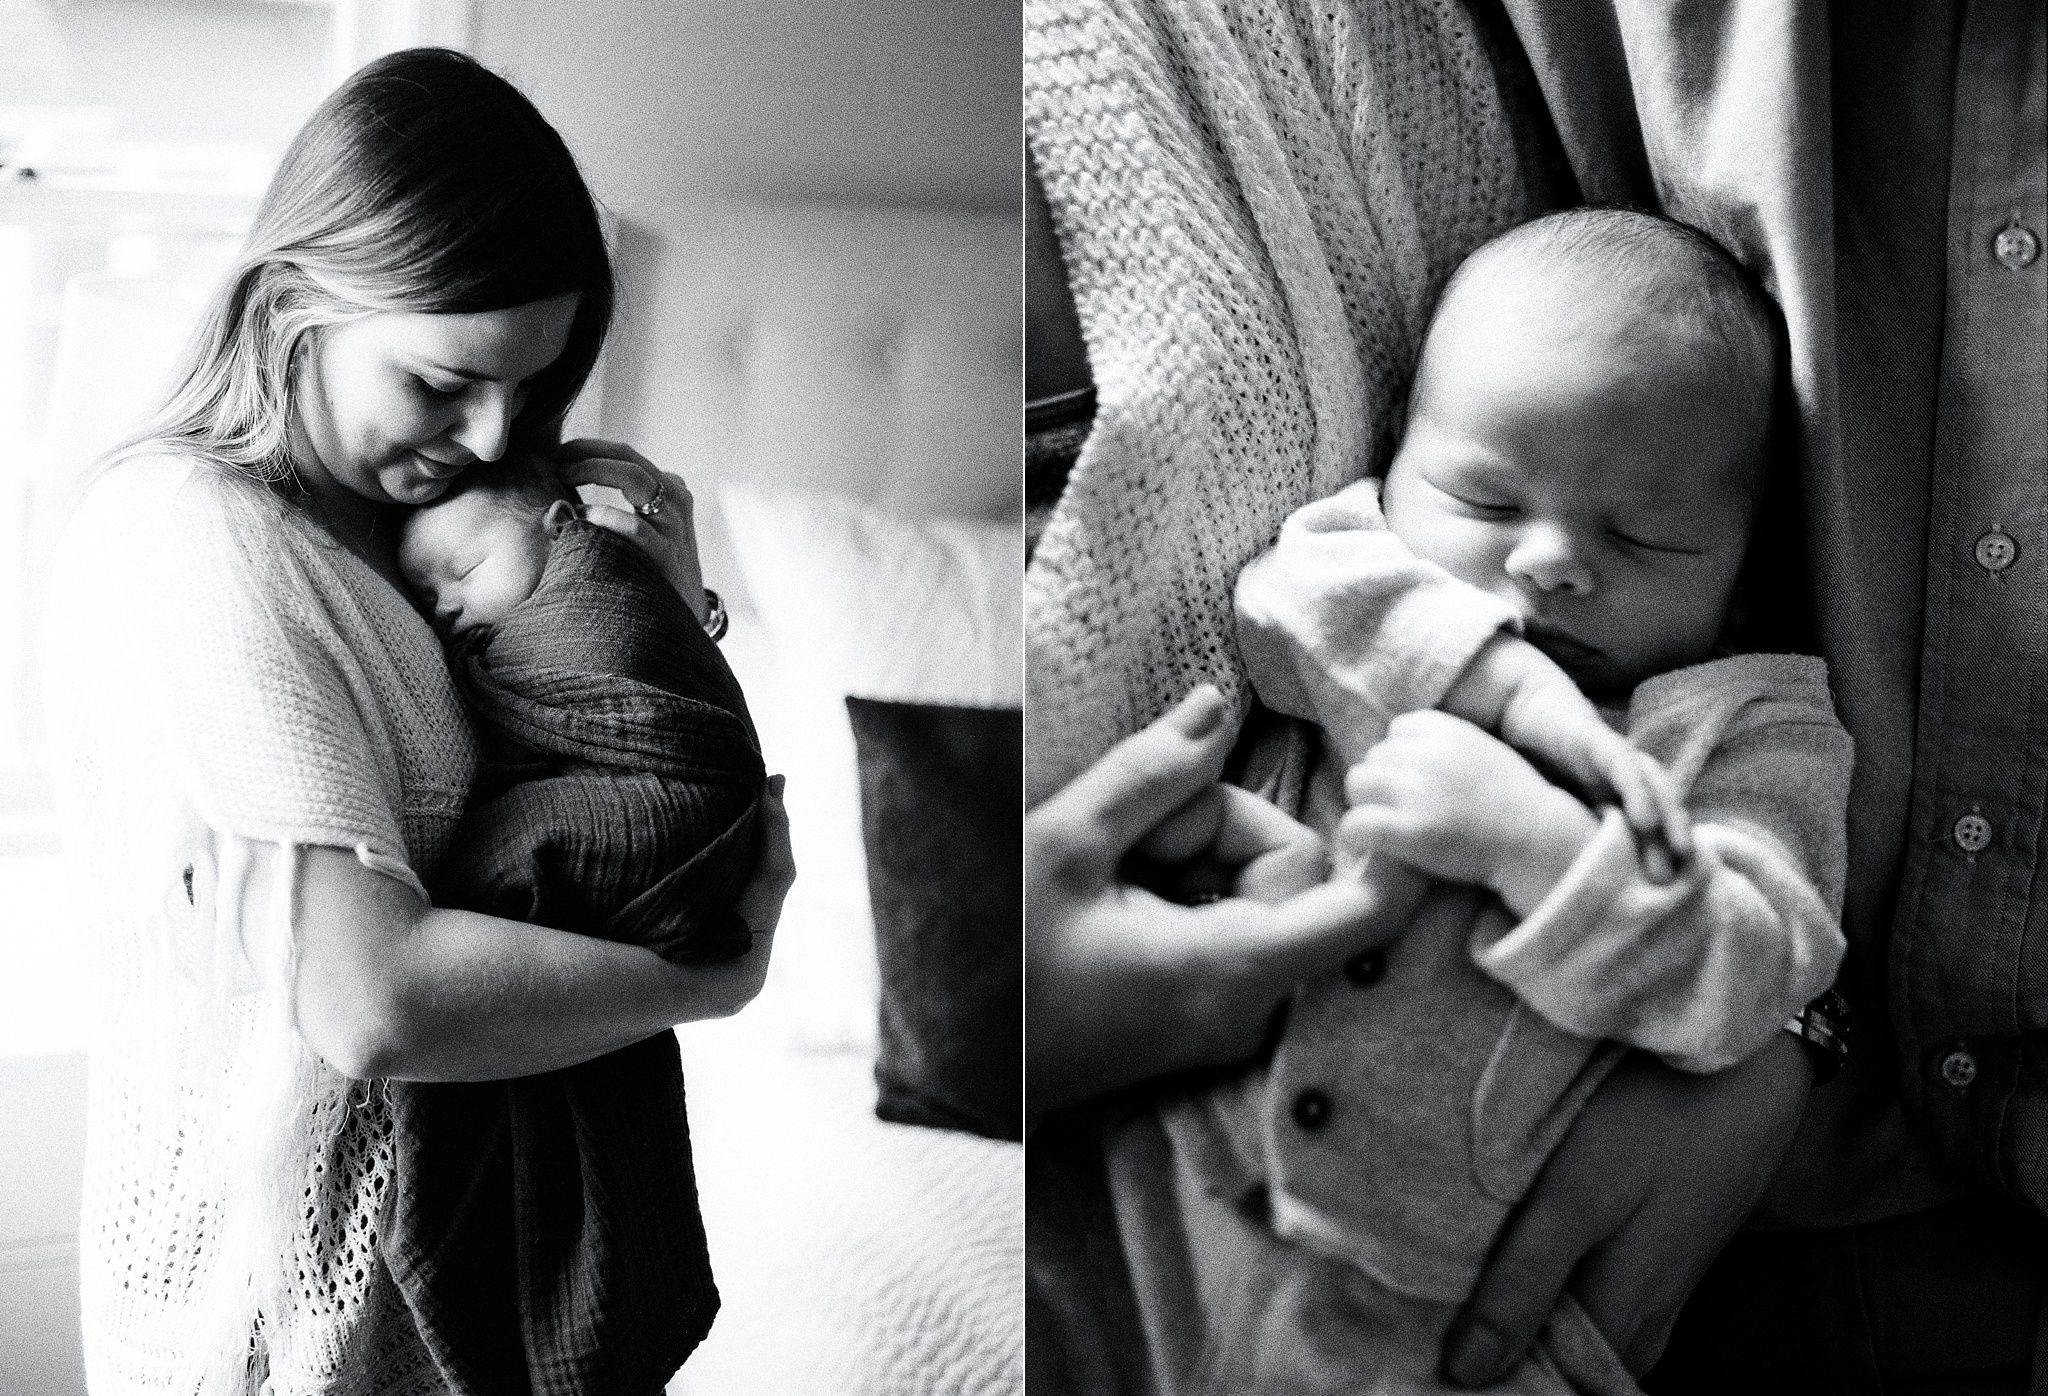 atlanta-georgia-fine-art-film-newborn-photographer-kaitlynne-grice-65.jpg